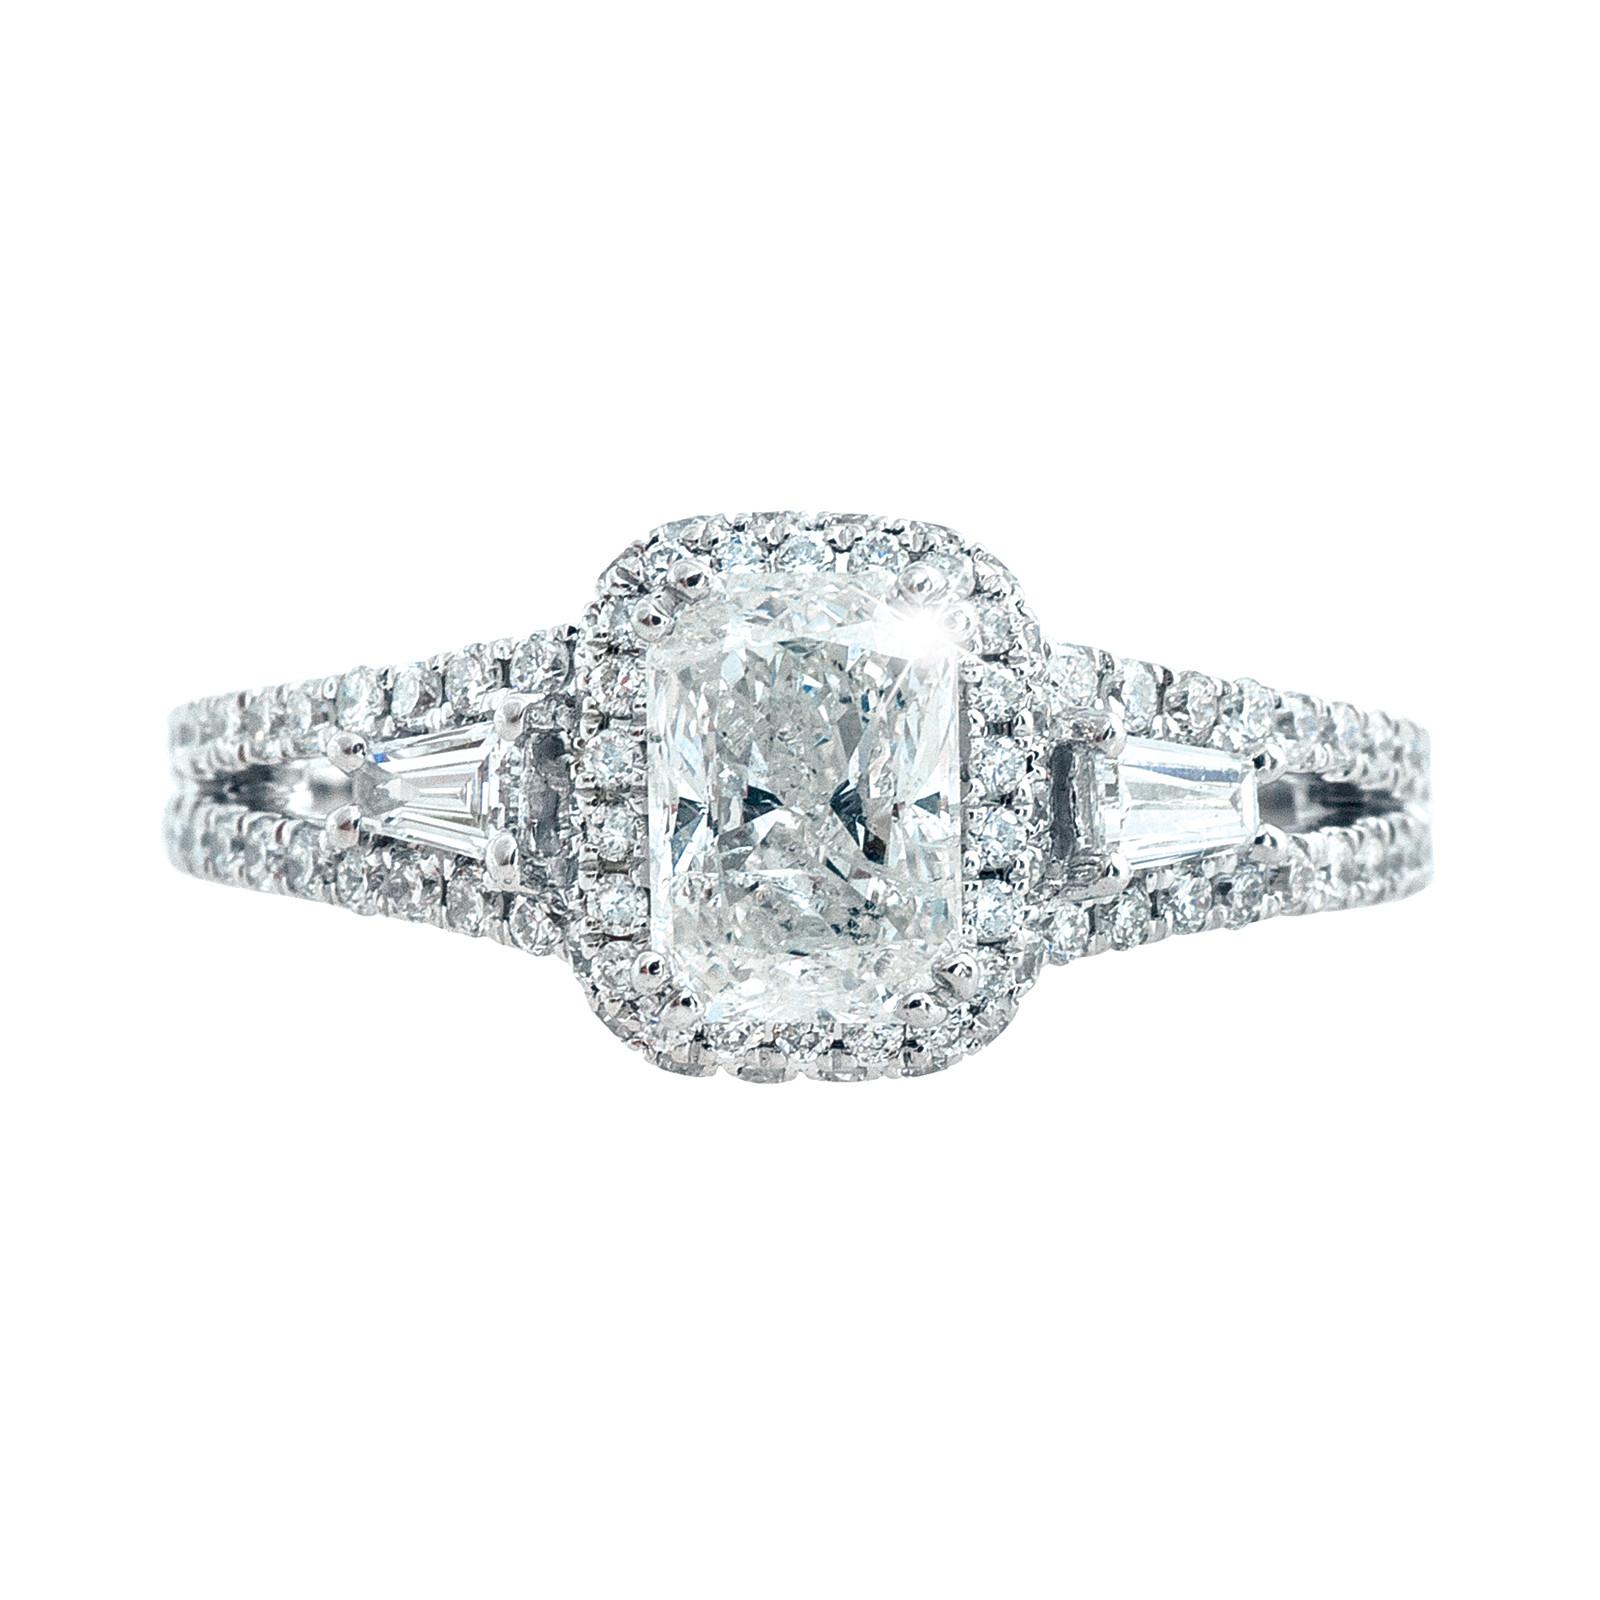 New 1.64 CTW Diamond Engagement Ring